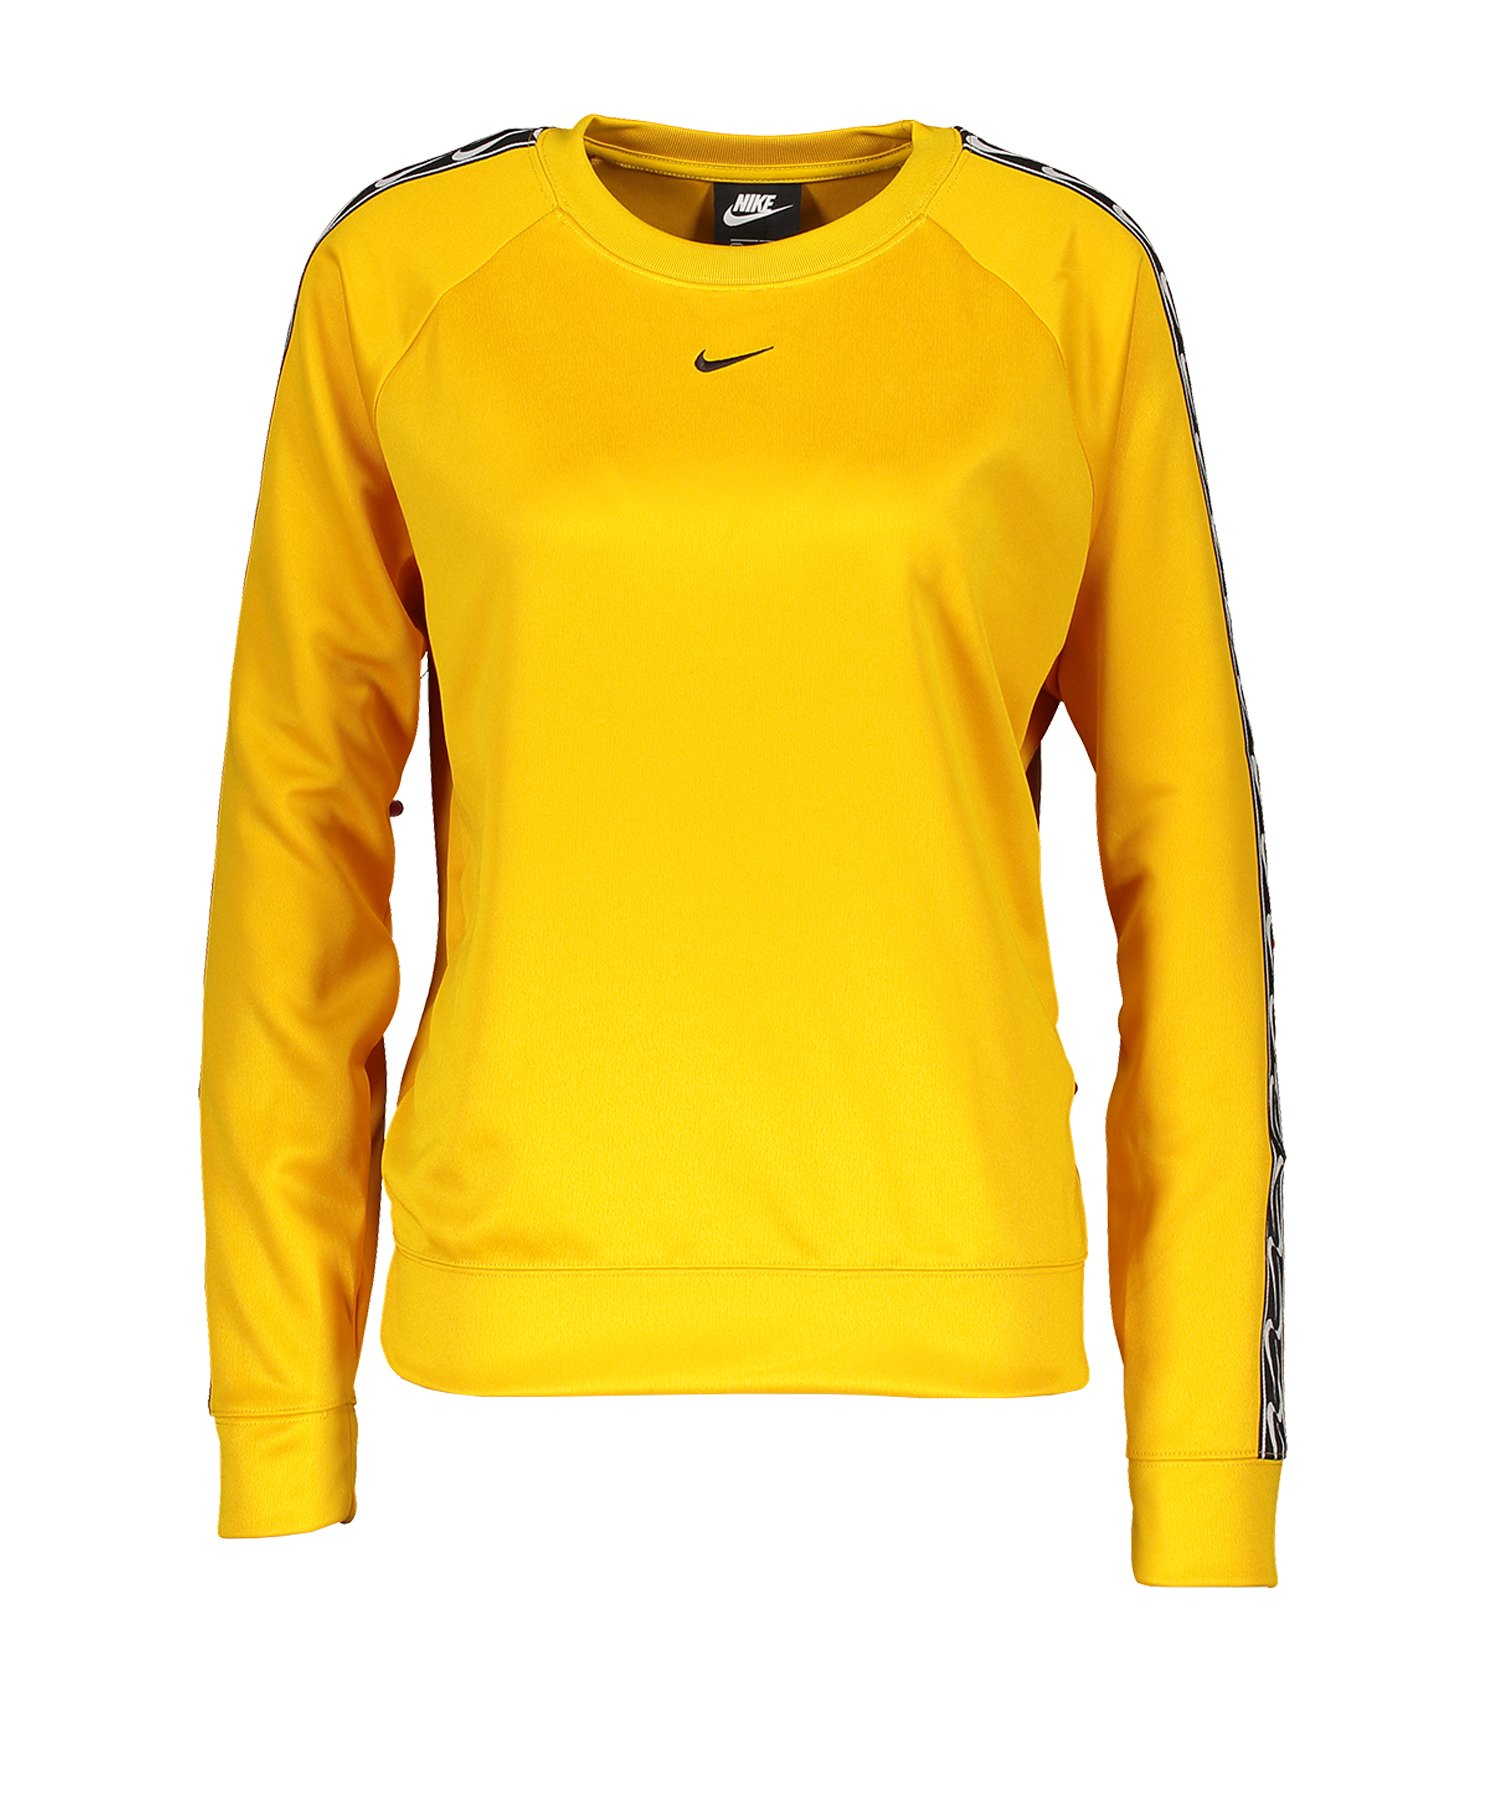 Nike Crew Logo Longsleeve Damen Gelb F743 - gelb